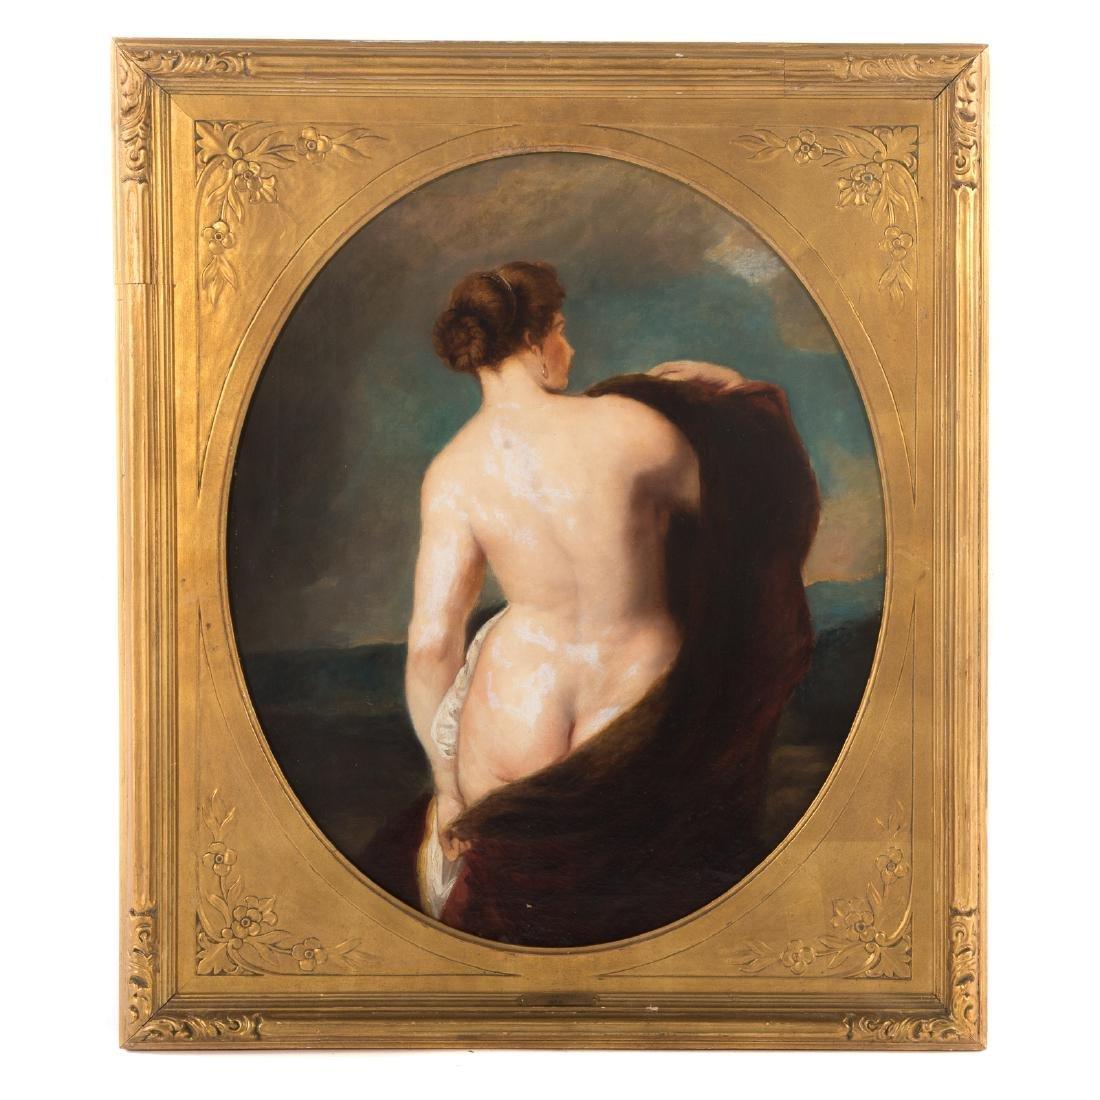 William Etty. Female Nude, Oil on Canvas